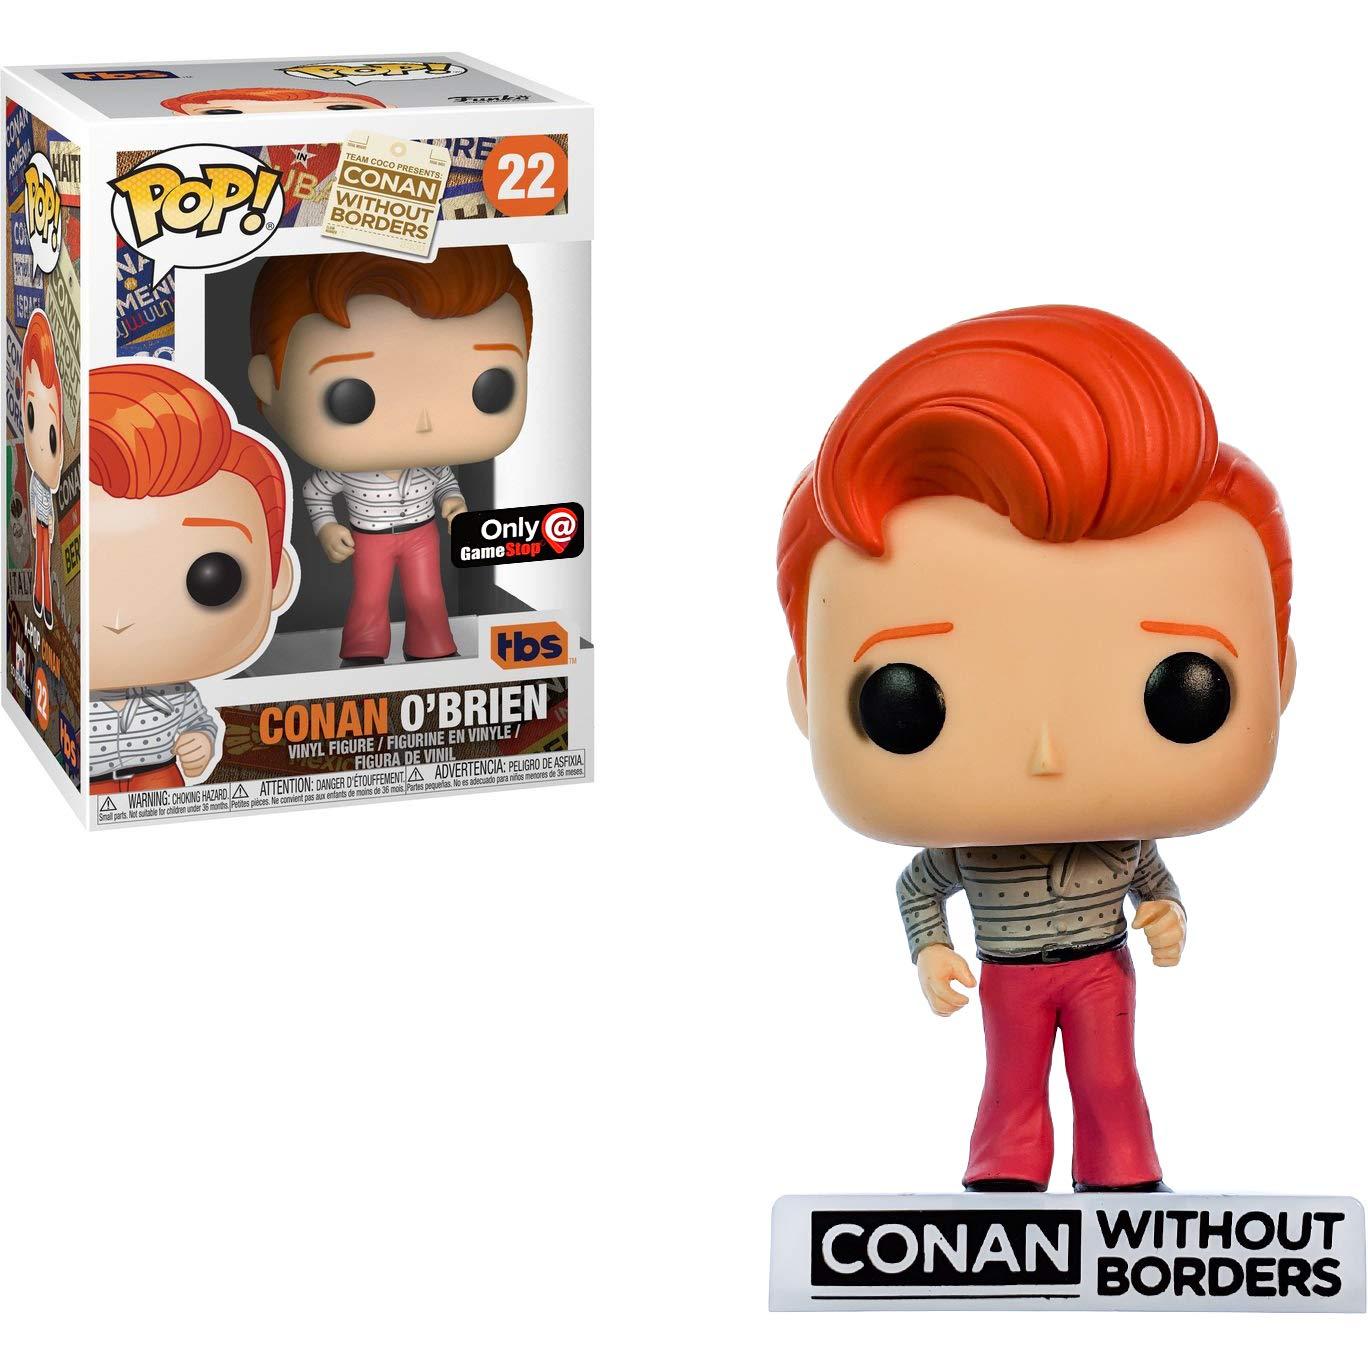 GameStop Exclusive : Conan Without Borders x POP Funko Conan OBrien Vinyl Figure /& 1 POP Compatible PET Plastic Graphical Protector Bundle BCC9U6093 #022 // 34932 - B